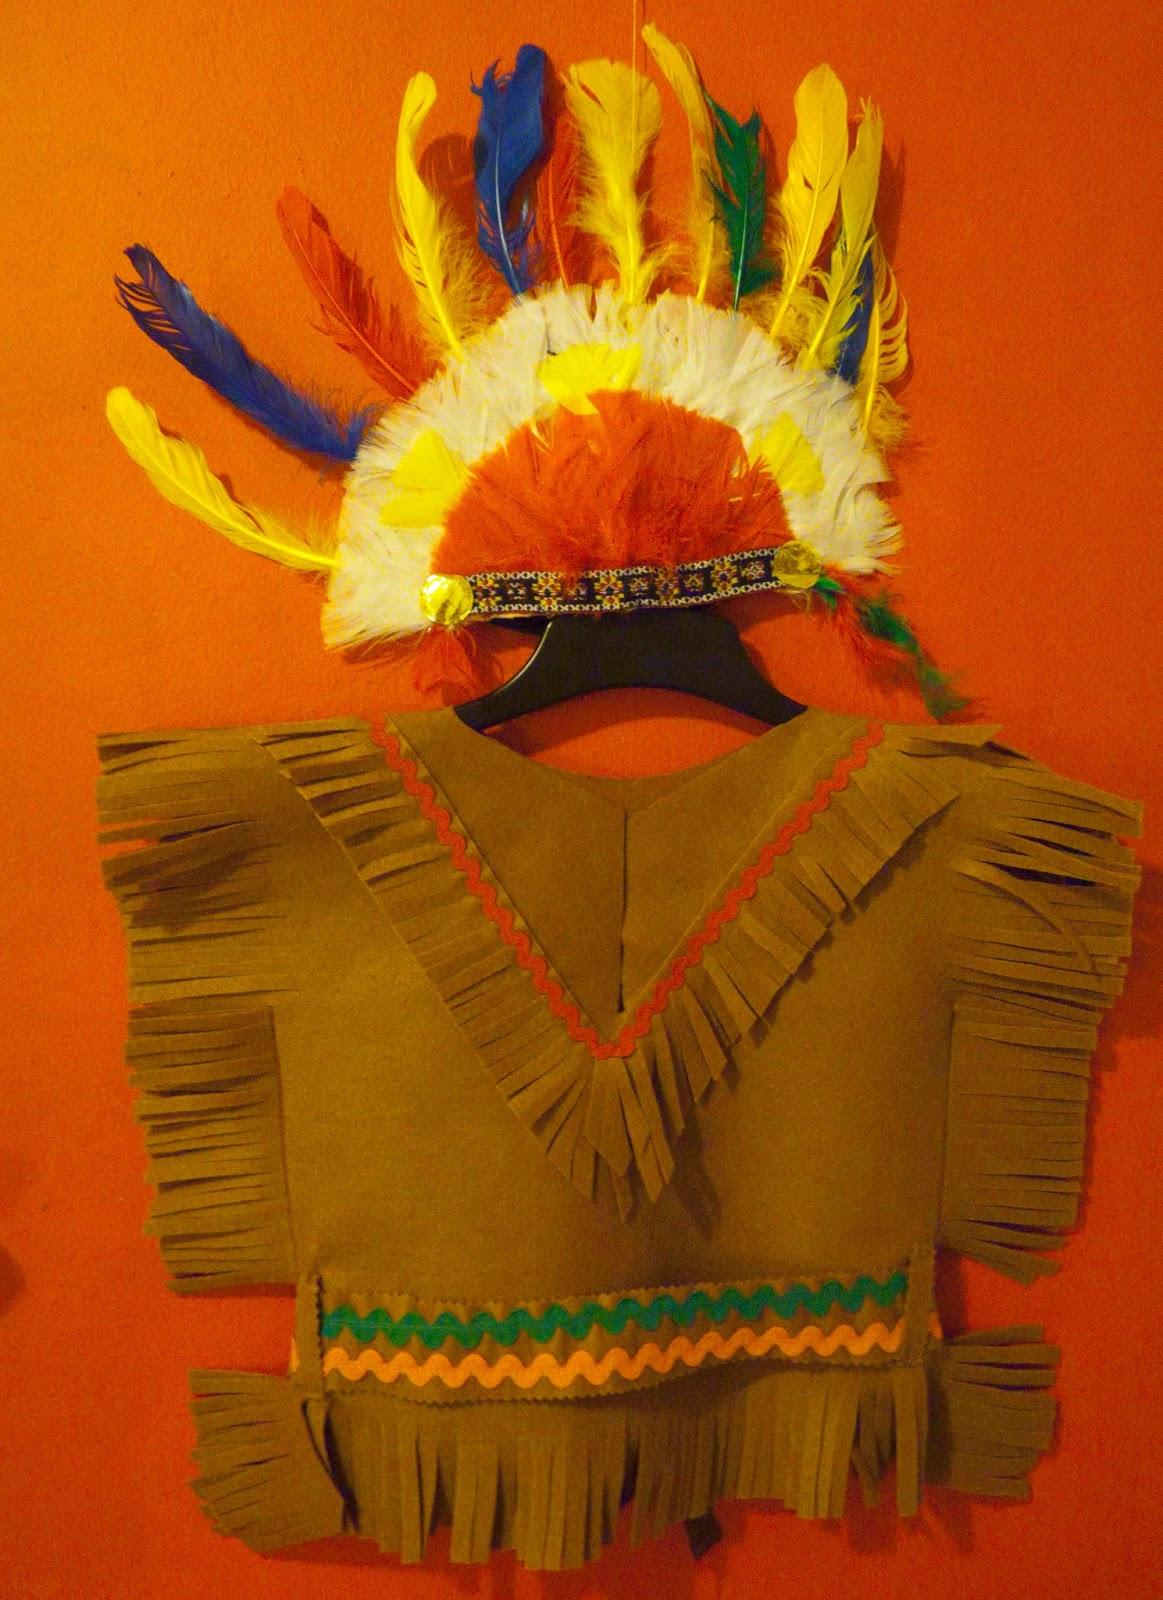 como hacer un disfraz de indio para nino paso a paso